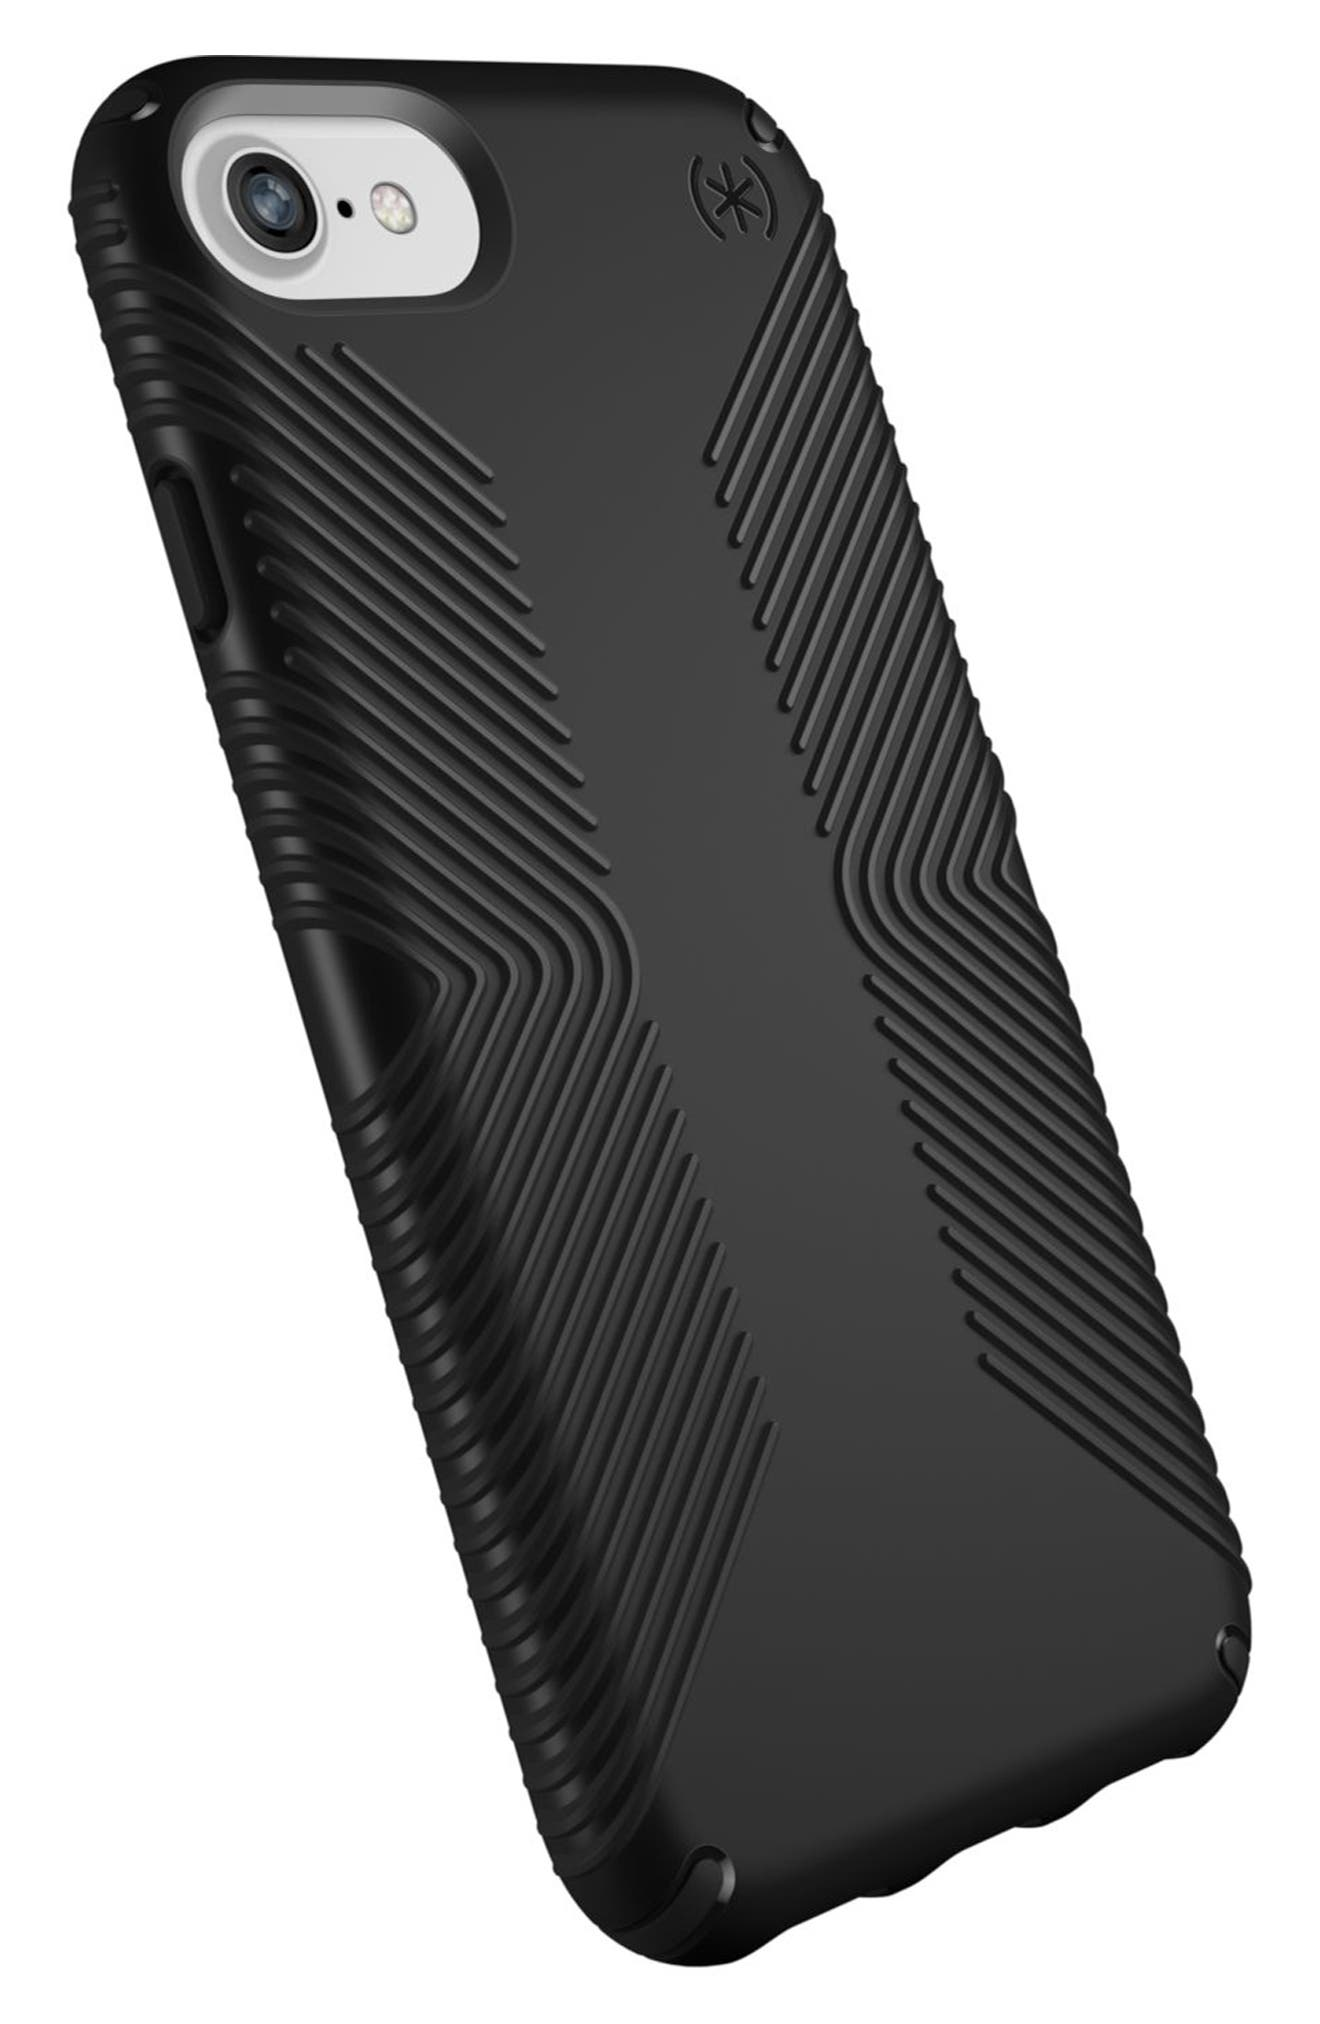 Grip iPhone 6/6s/7/8 Case,                             Alternate thumbnail 5, color,                             001